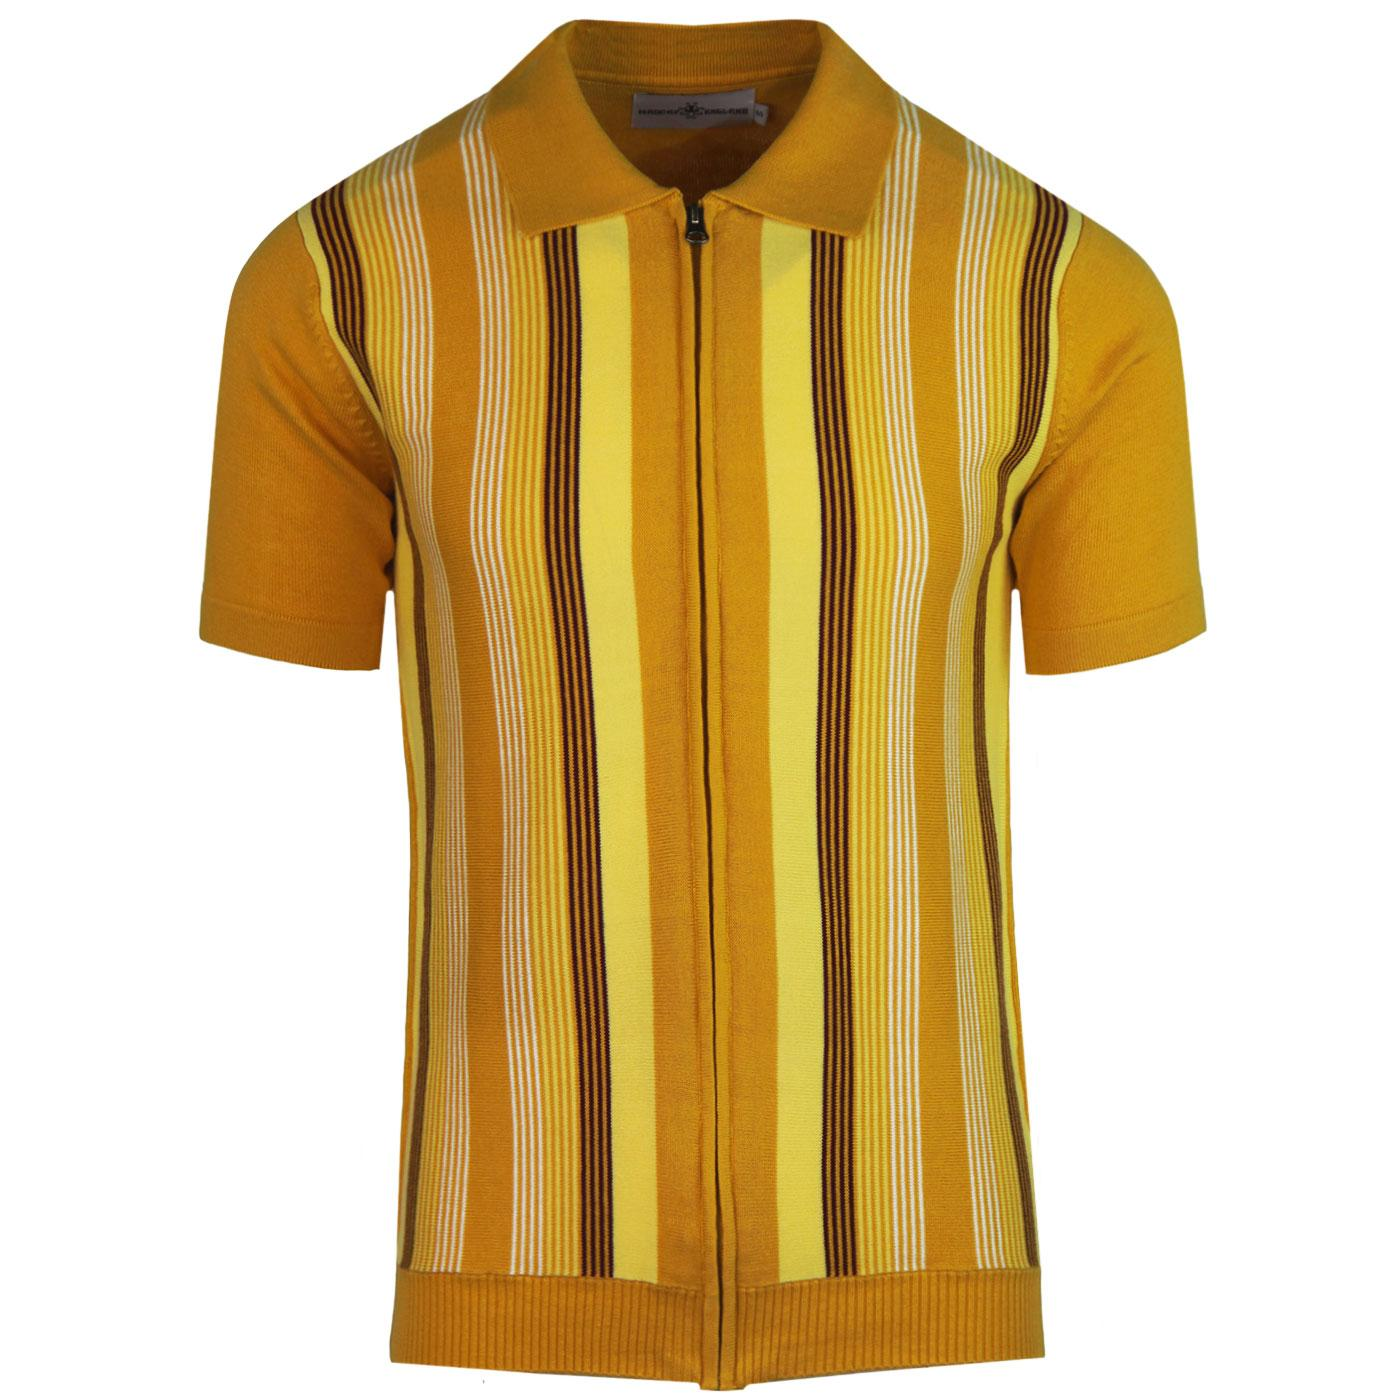 Capitol MADCAP ENGLAND Mod Stripe Zip Polo (GG)